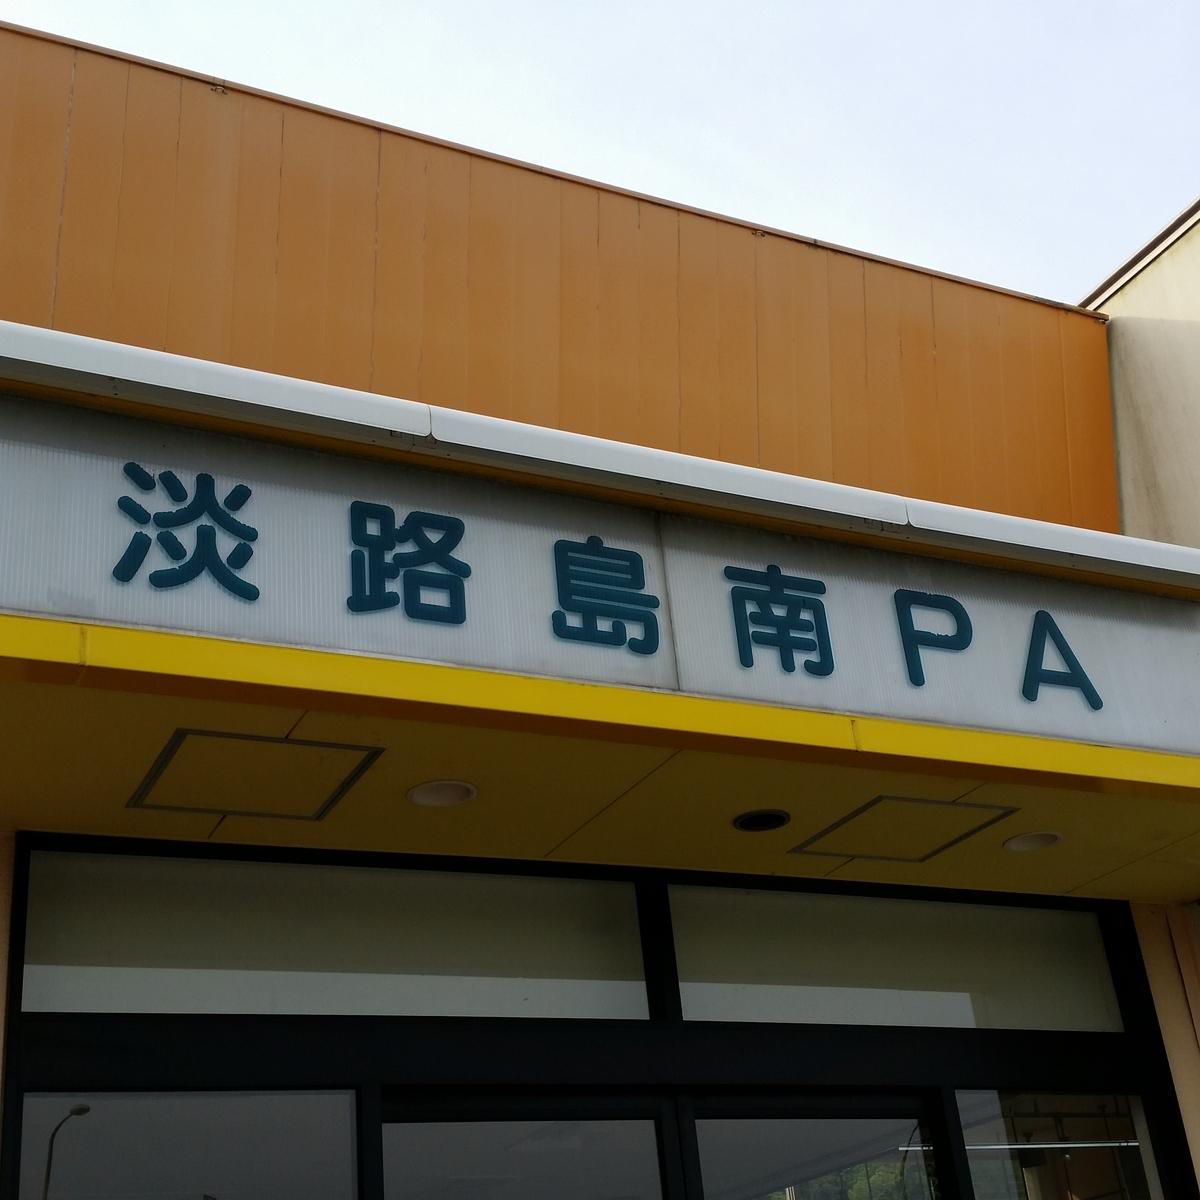 f:id:ichigo-ichie411211:20190505181459j:plain